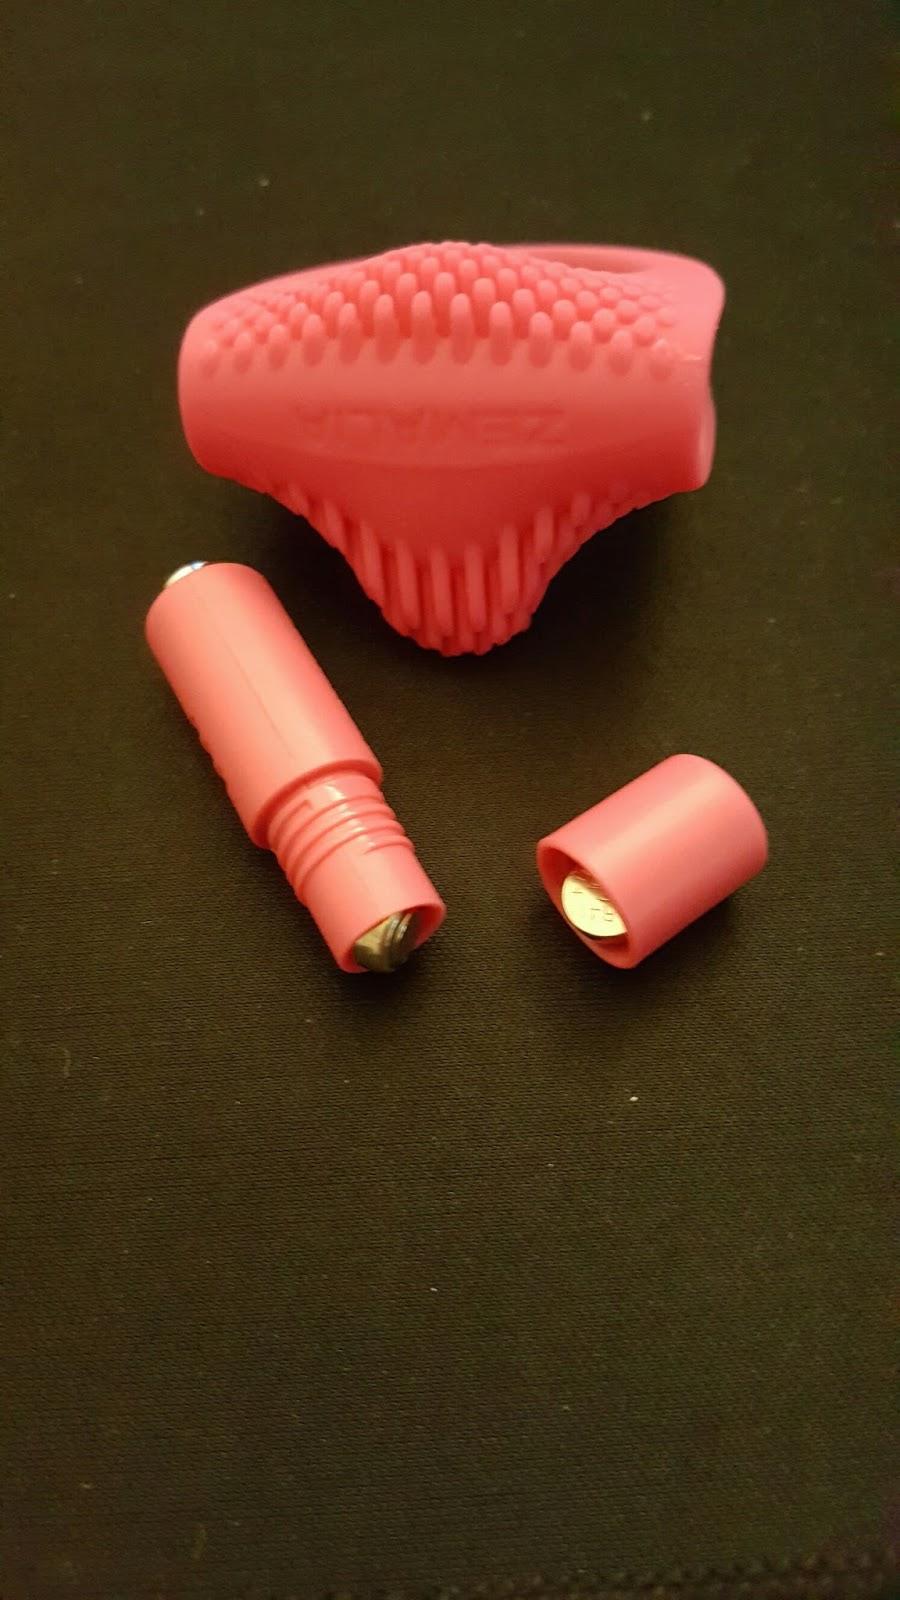 lahr2006 testet zemalia vibrator ring perfekt f r paare. Black Bedroom Furniture Sets. Home Design Ideas